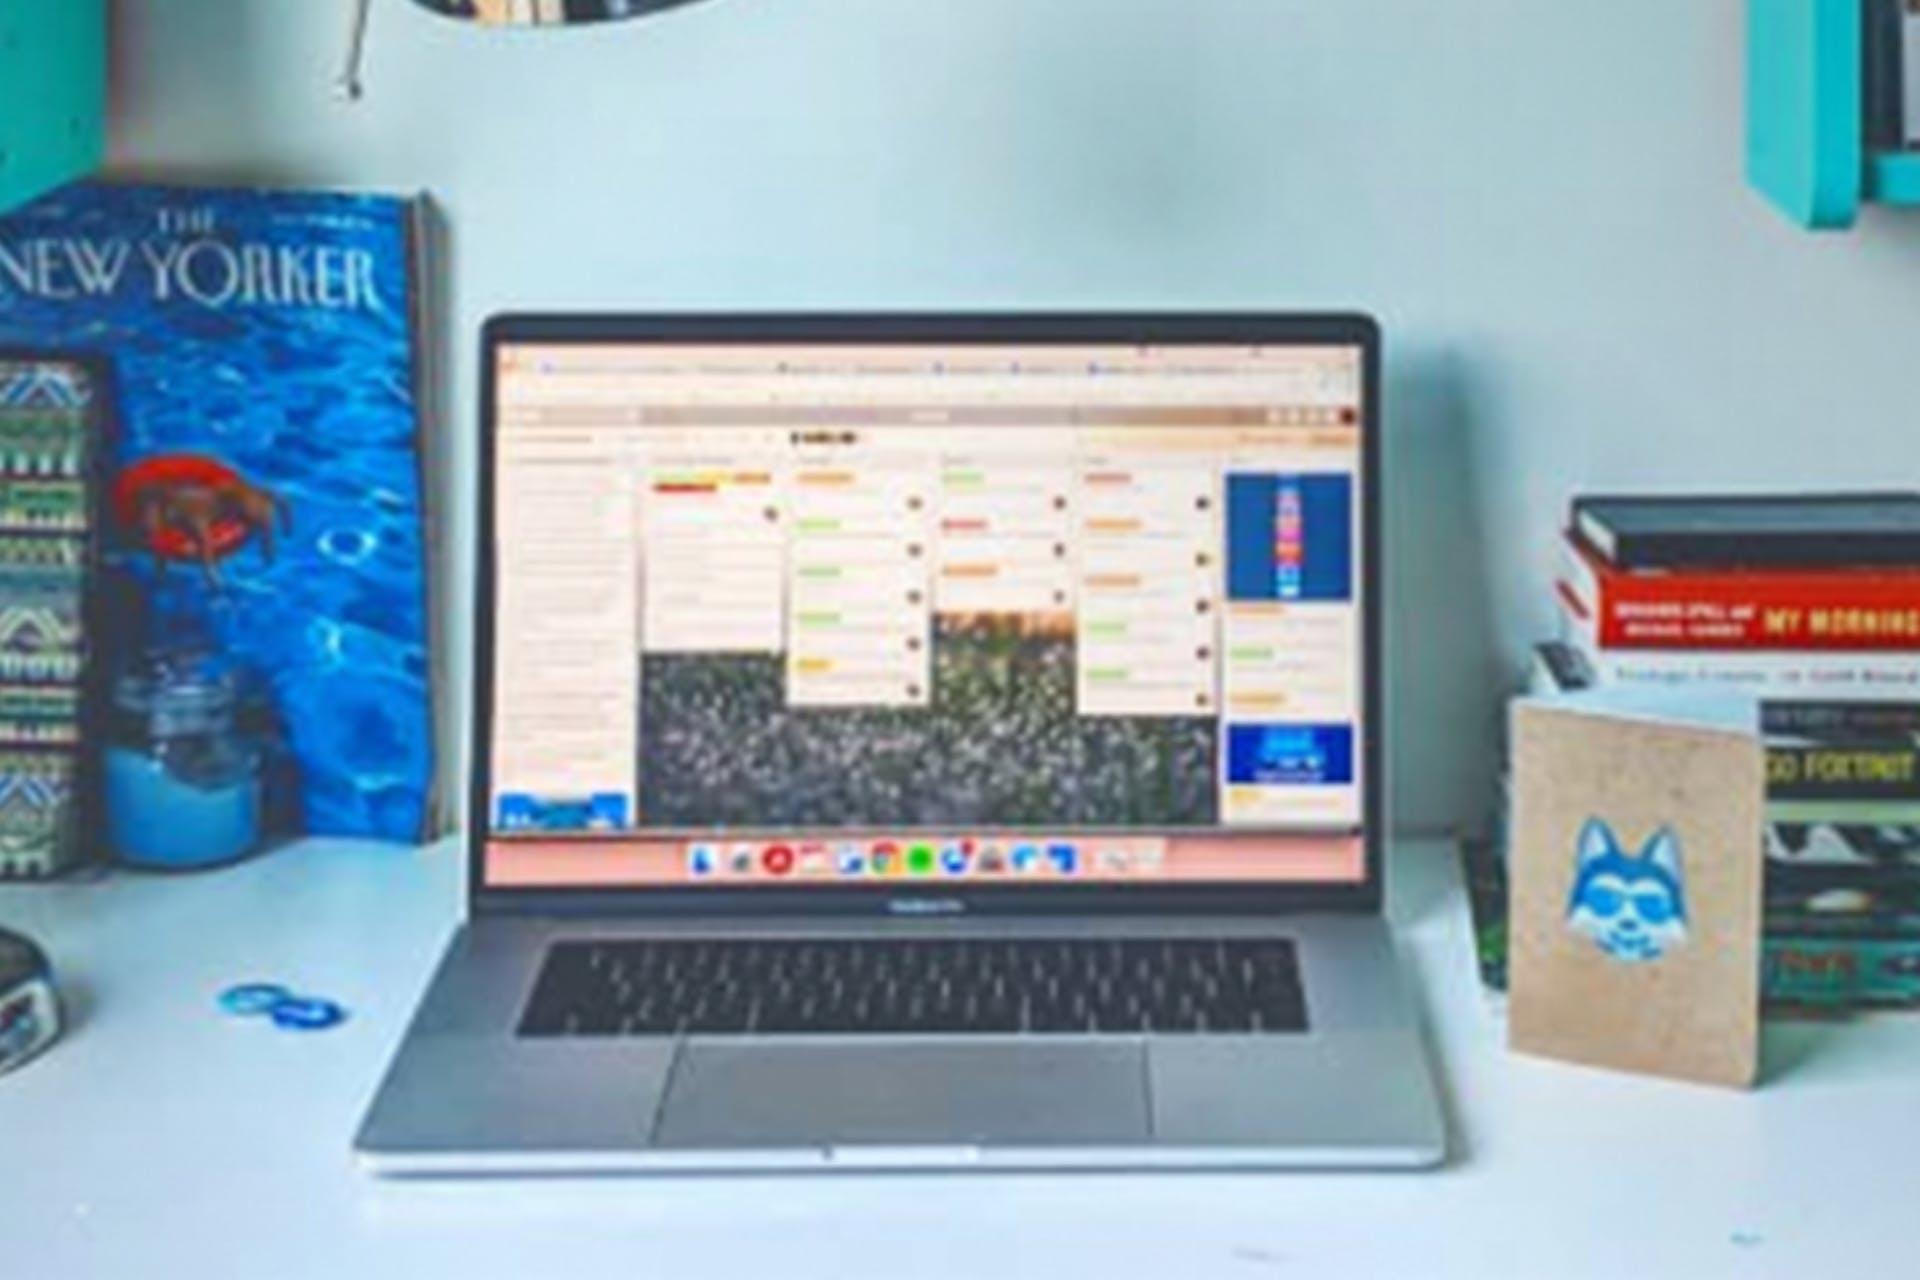 Saas social media laptop on desk